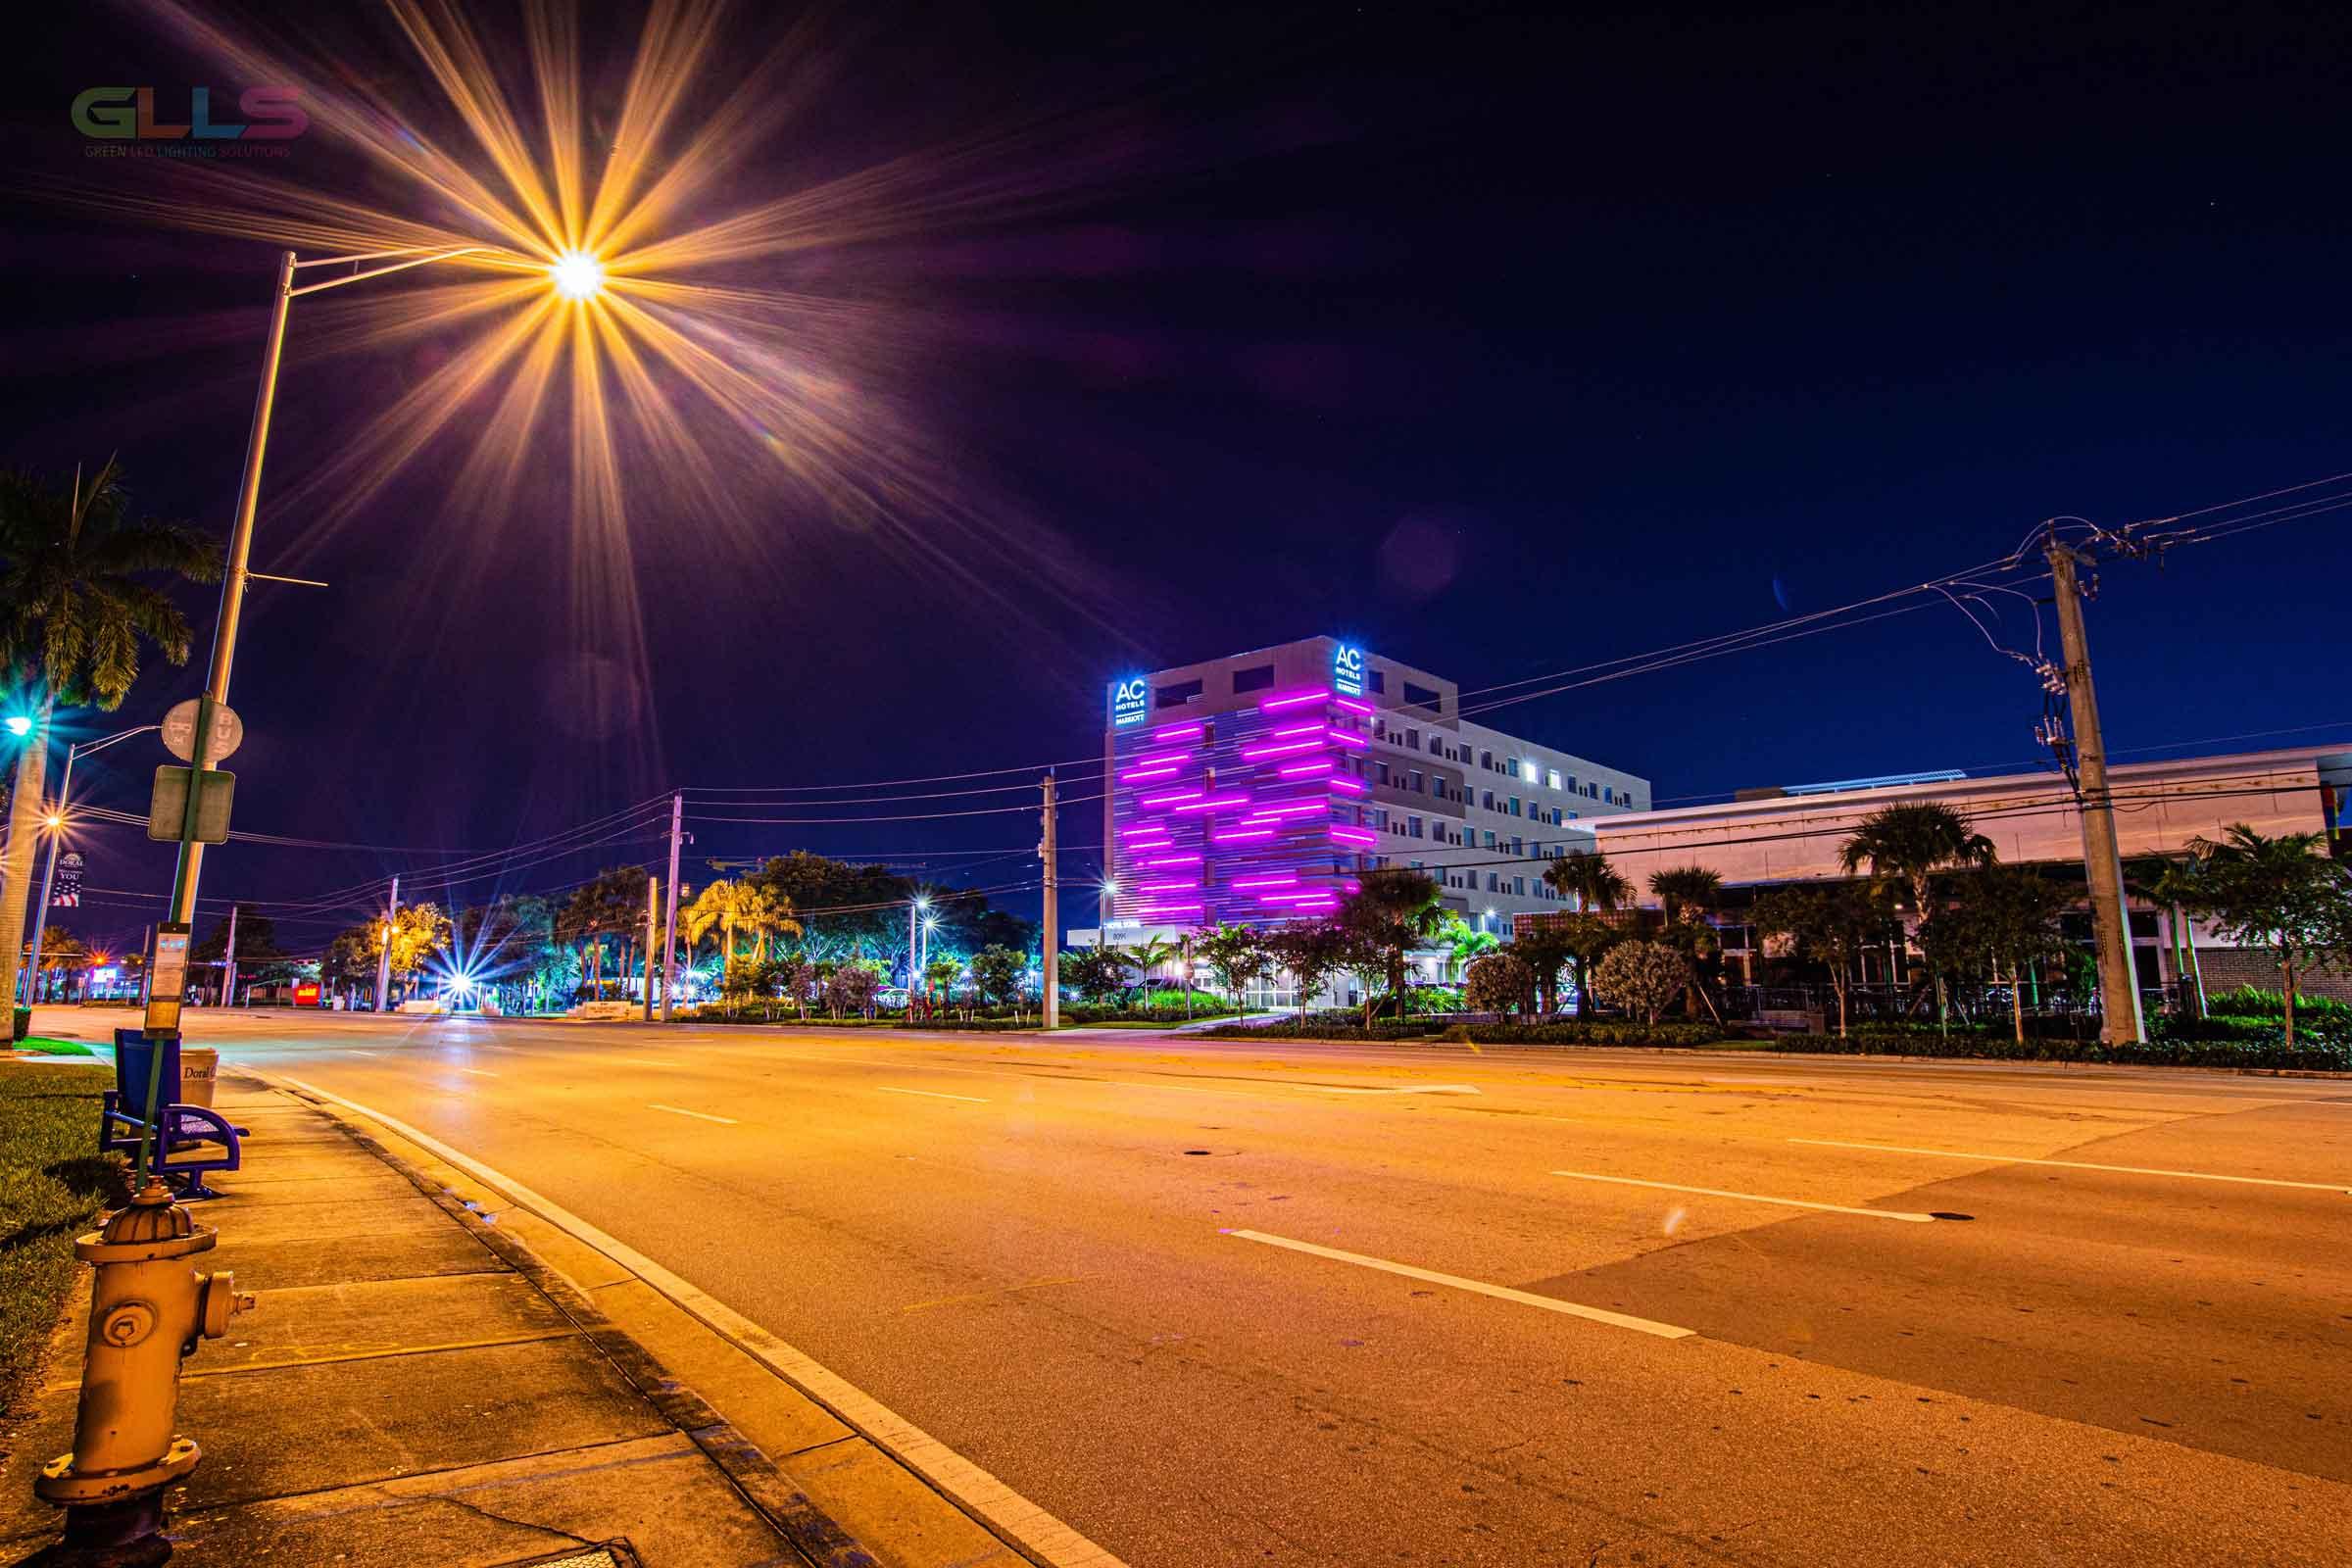 AC-Hotel-Aventura-Florida4